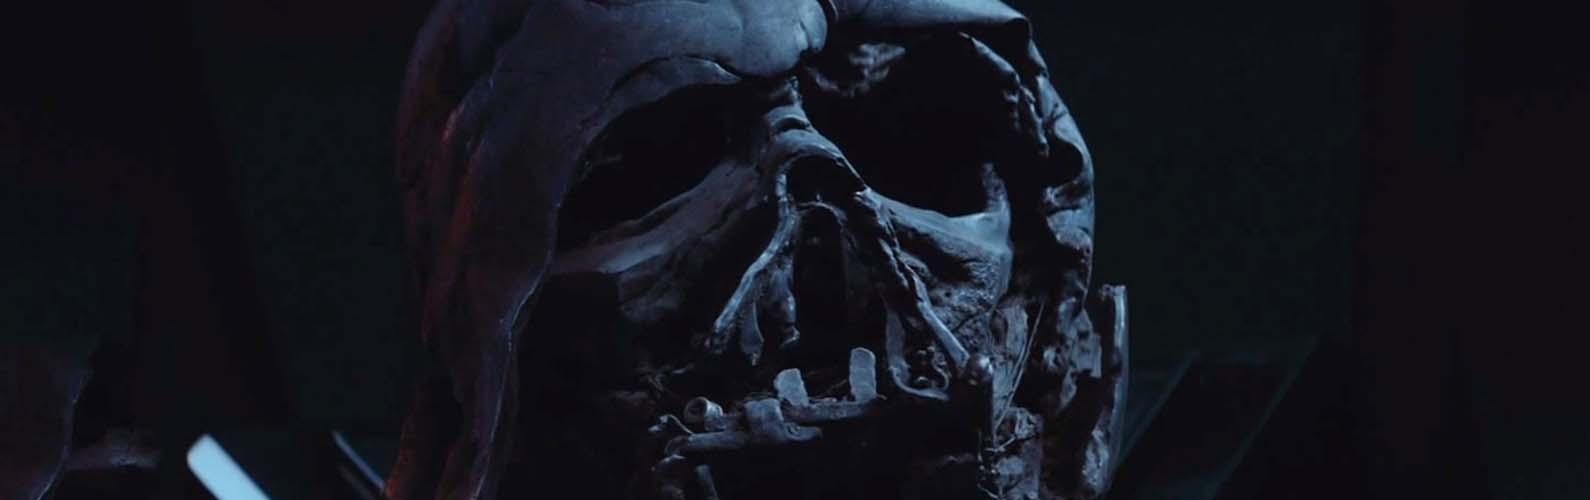 Star Wars: Hvem er egentlig Snoke?